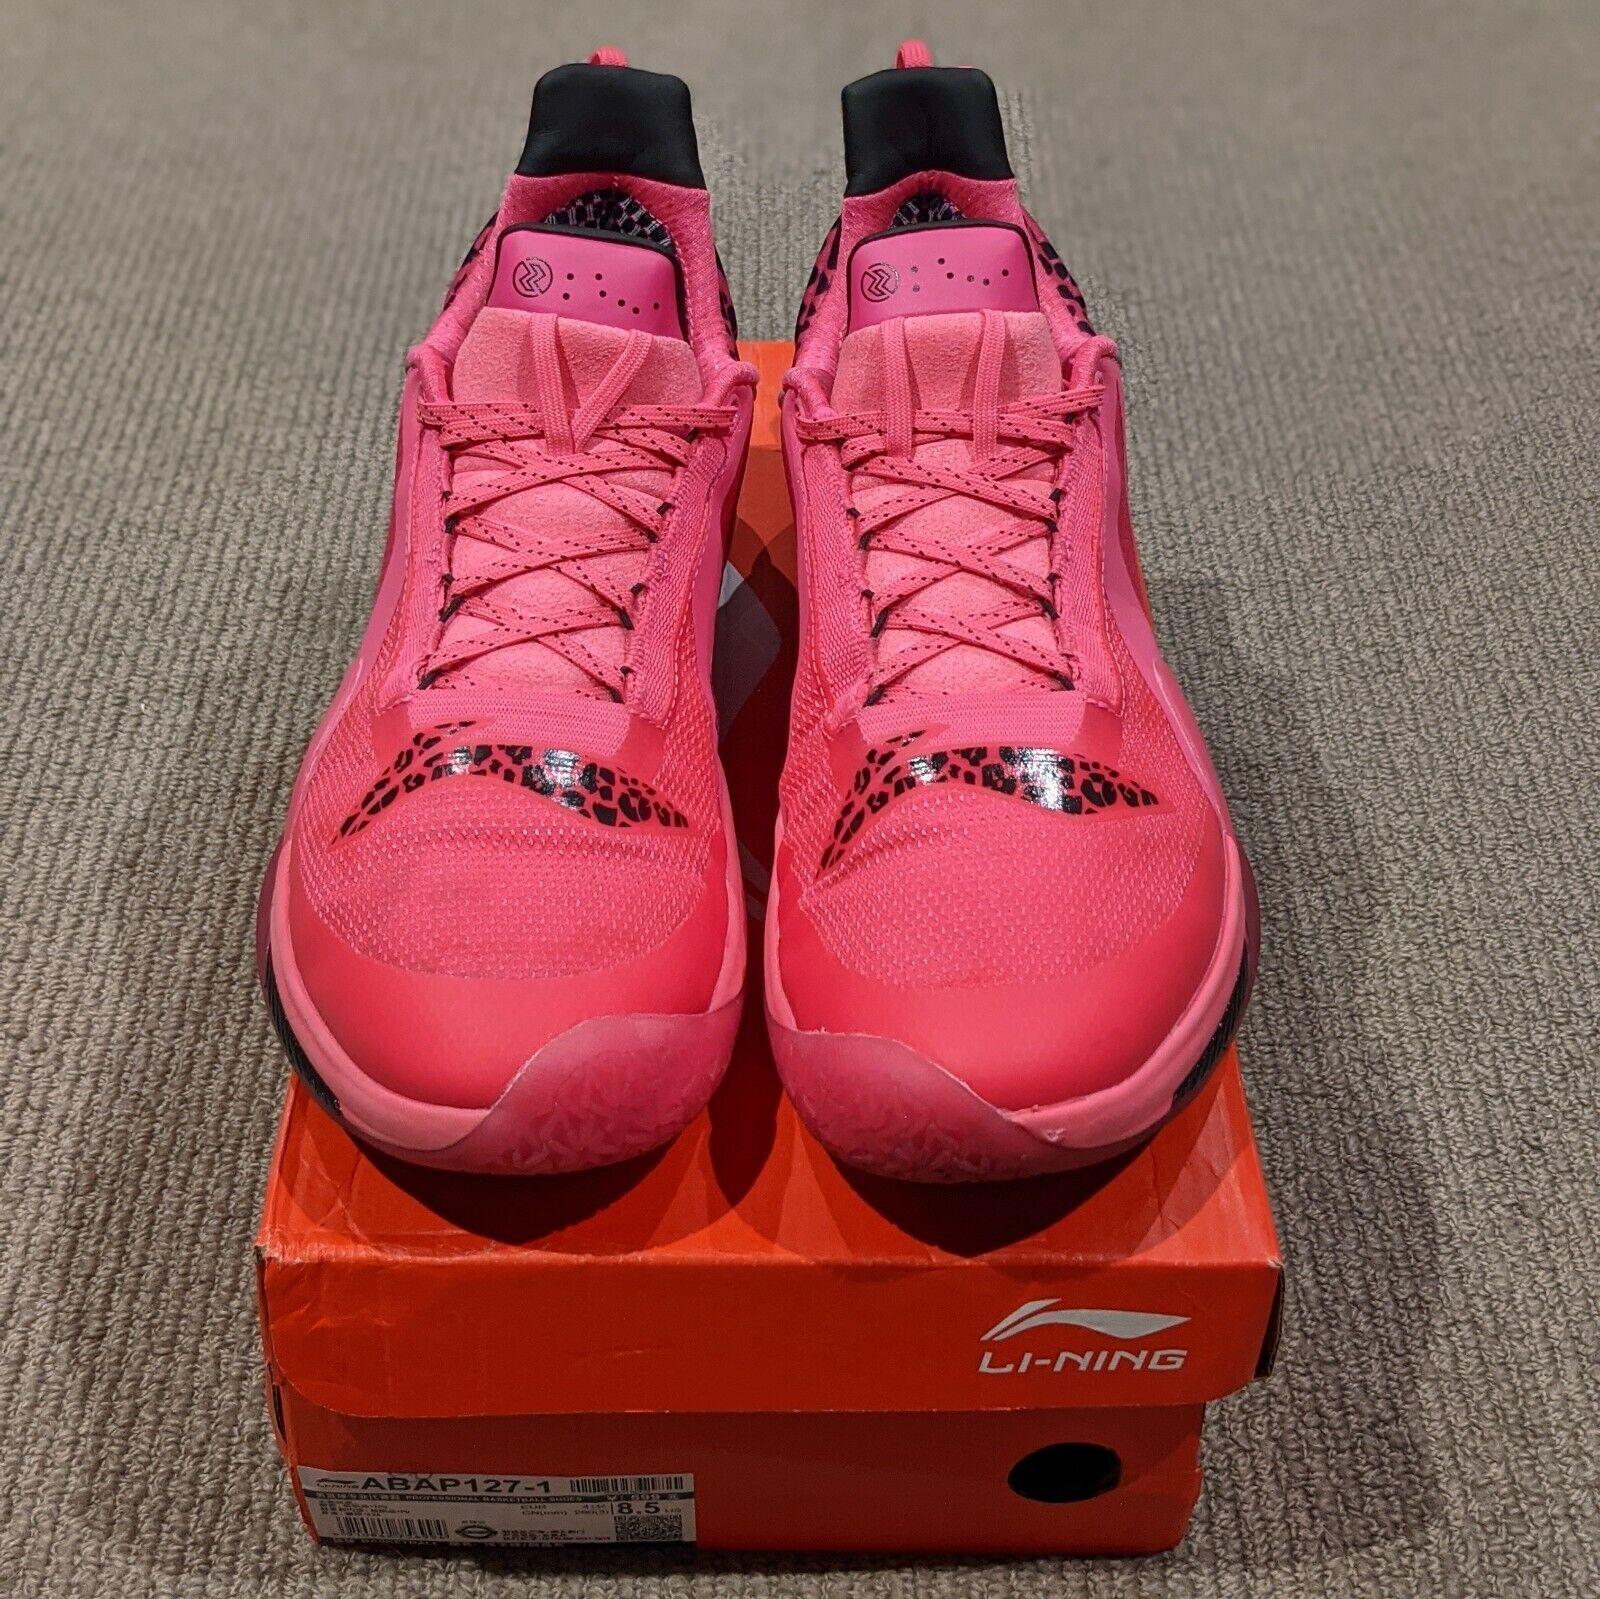 Li-Ning Speed 7 Basketball Shoes US 8.5